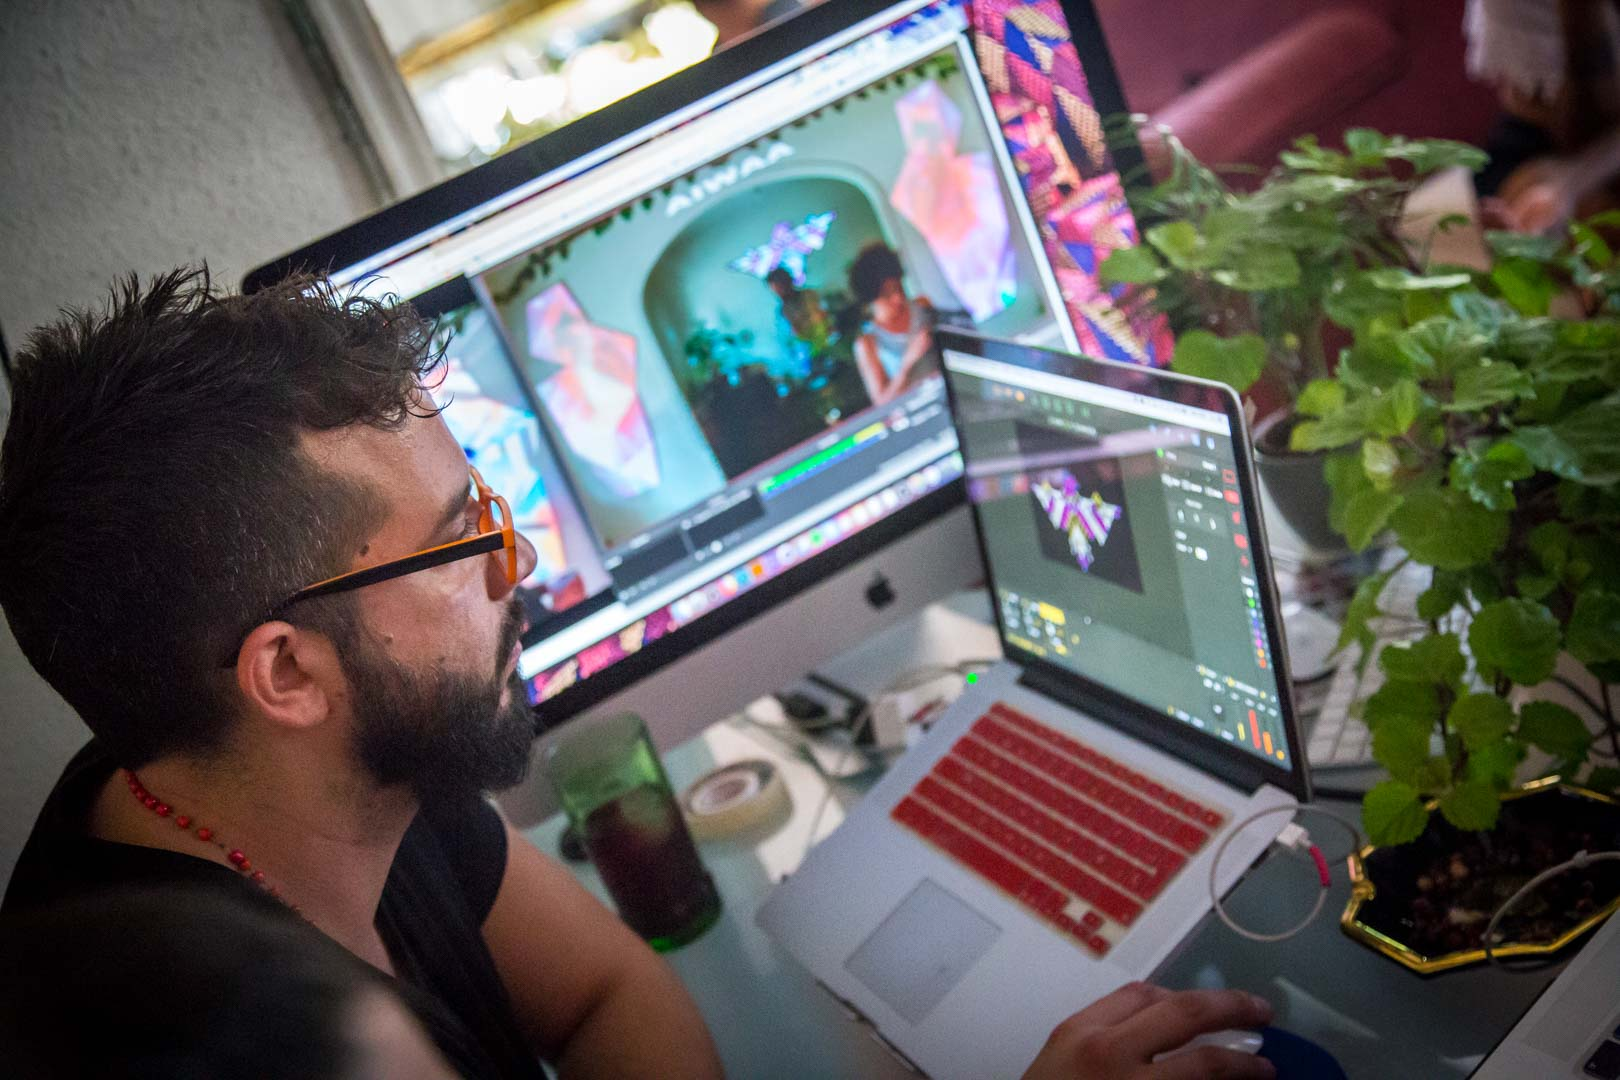 Ari Agliati Icaro session Visuales Nidra Video Mapping